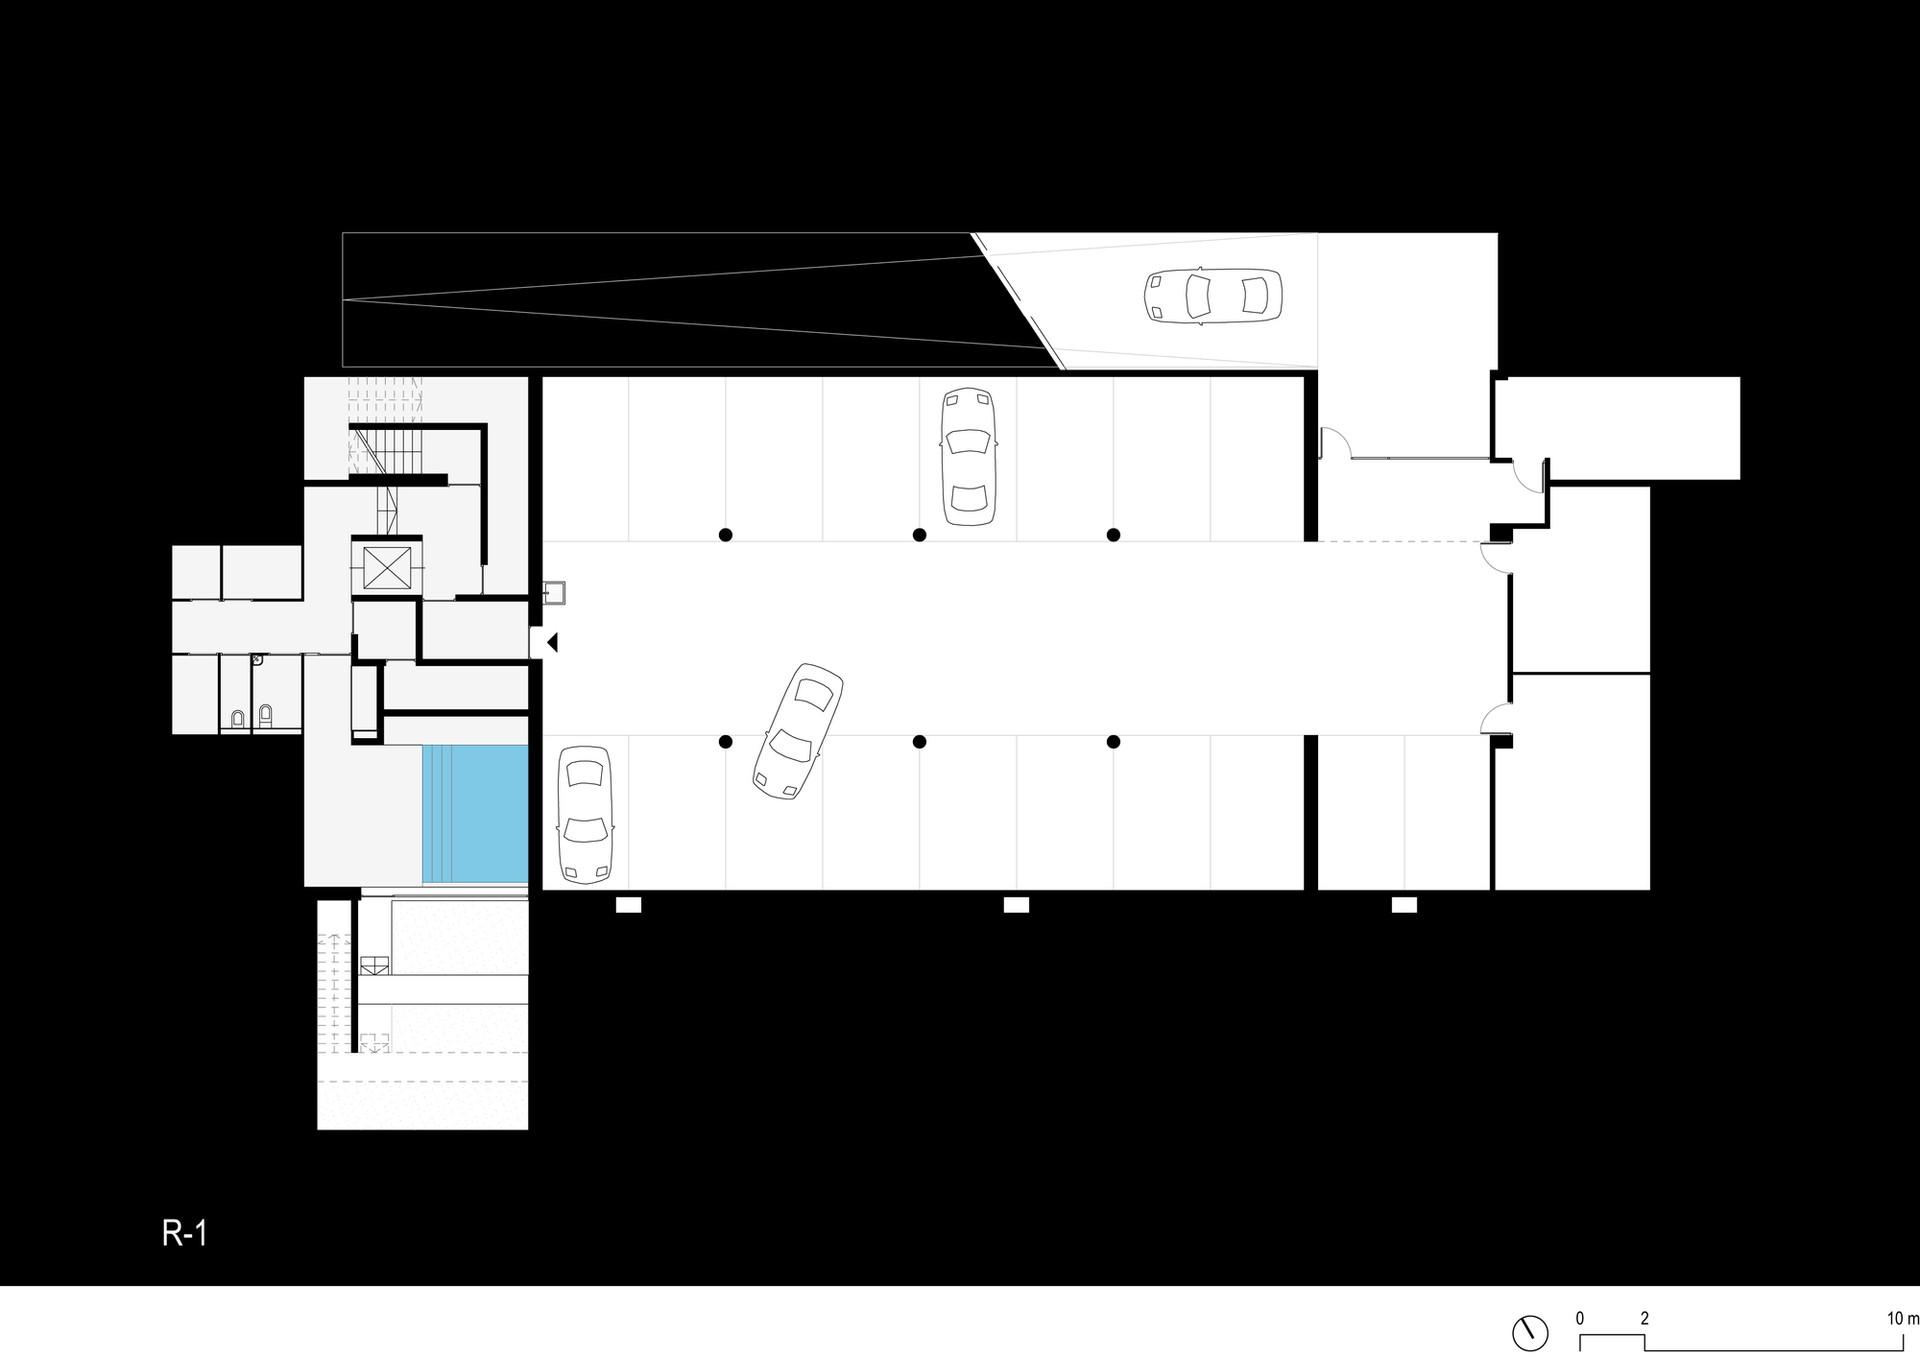 APA_E plan R-1.jpg